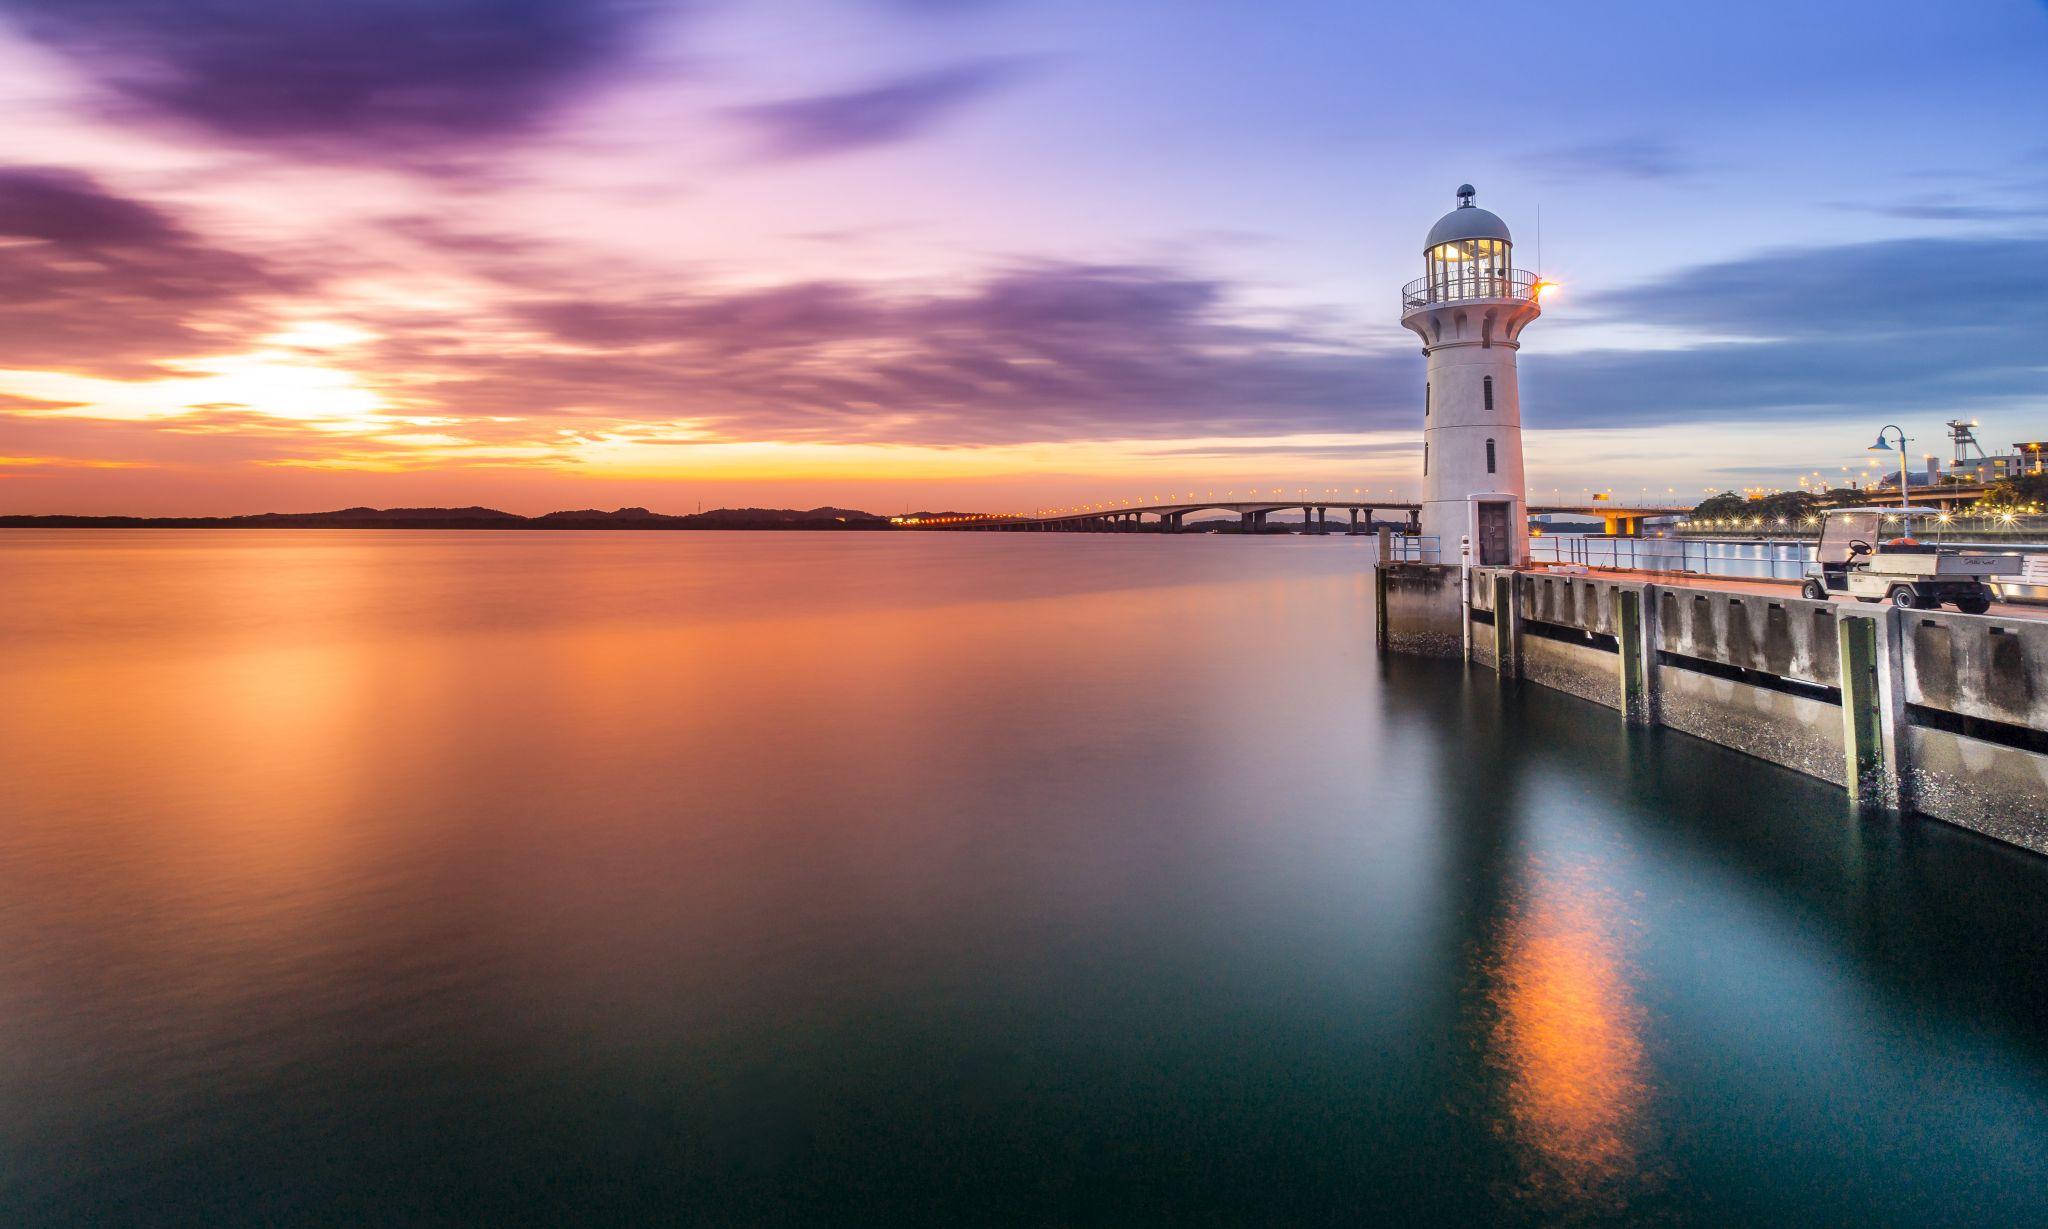 Raffles Marina Lighthouse, Singapore, Singapore